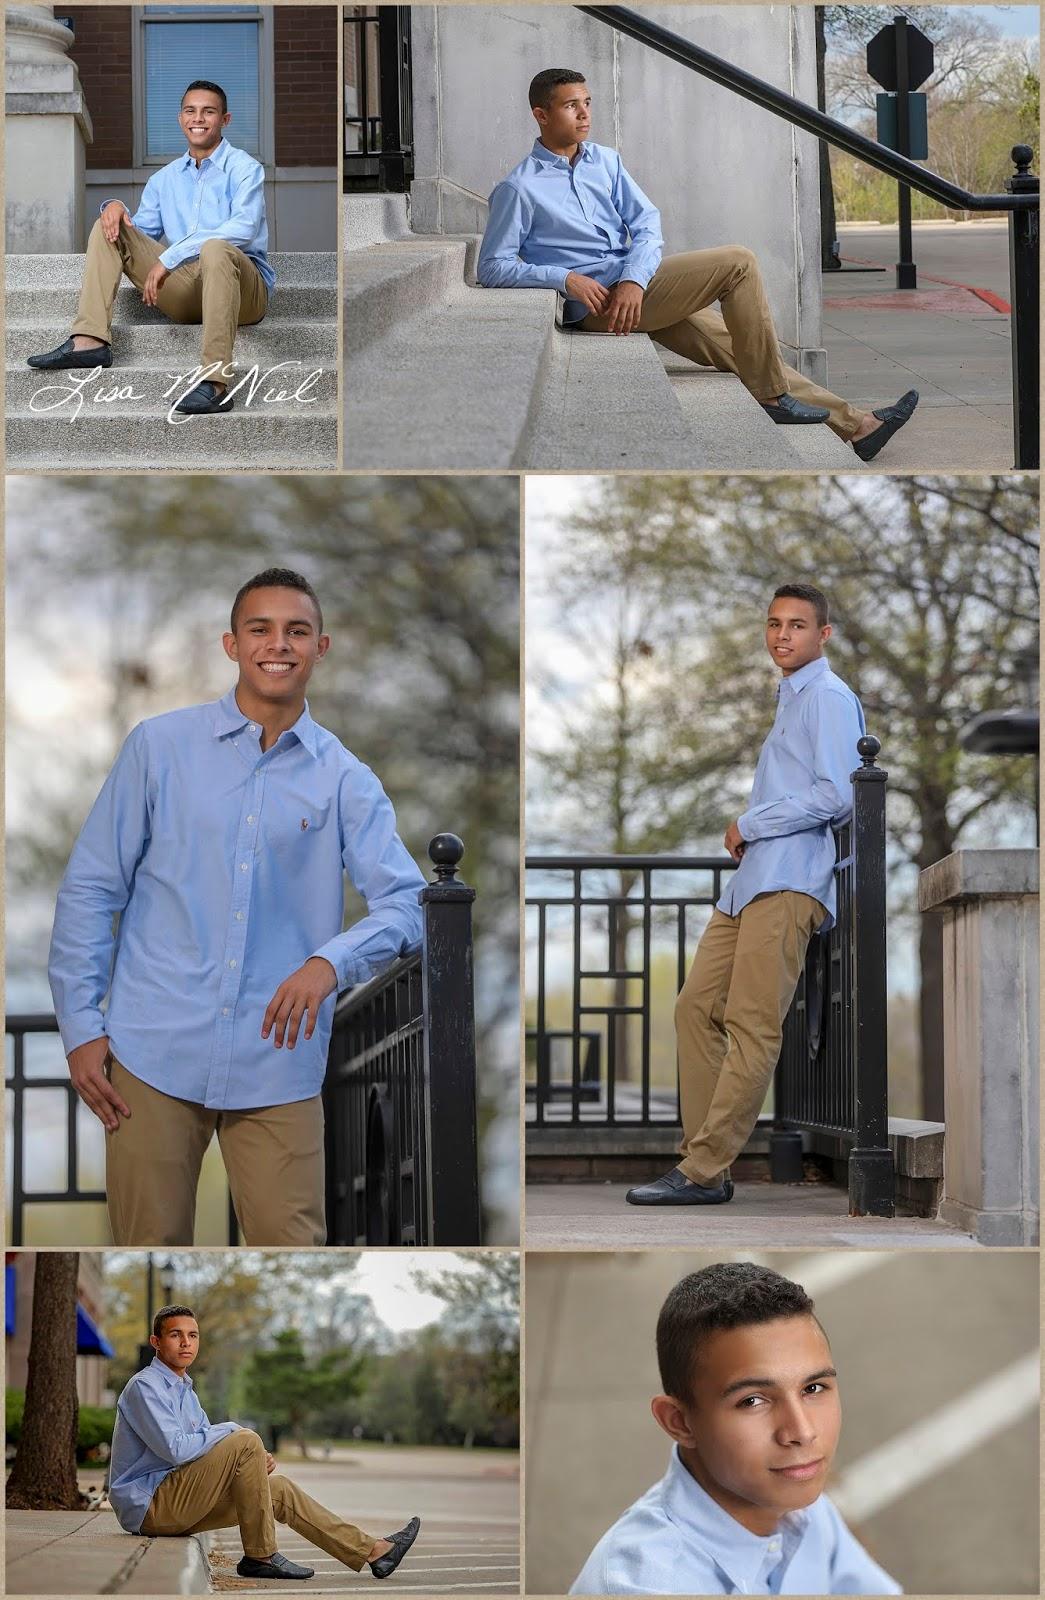 collage of teen boy wearing blue shirt